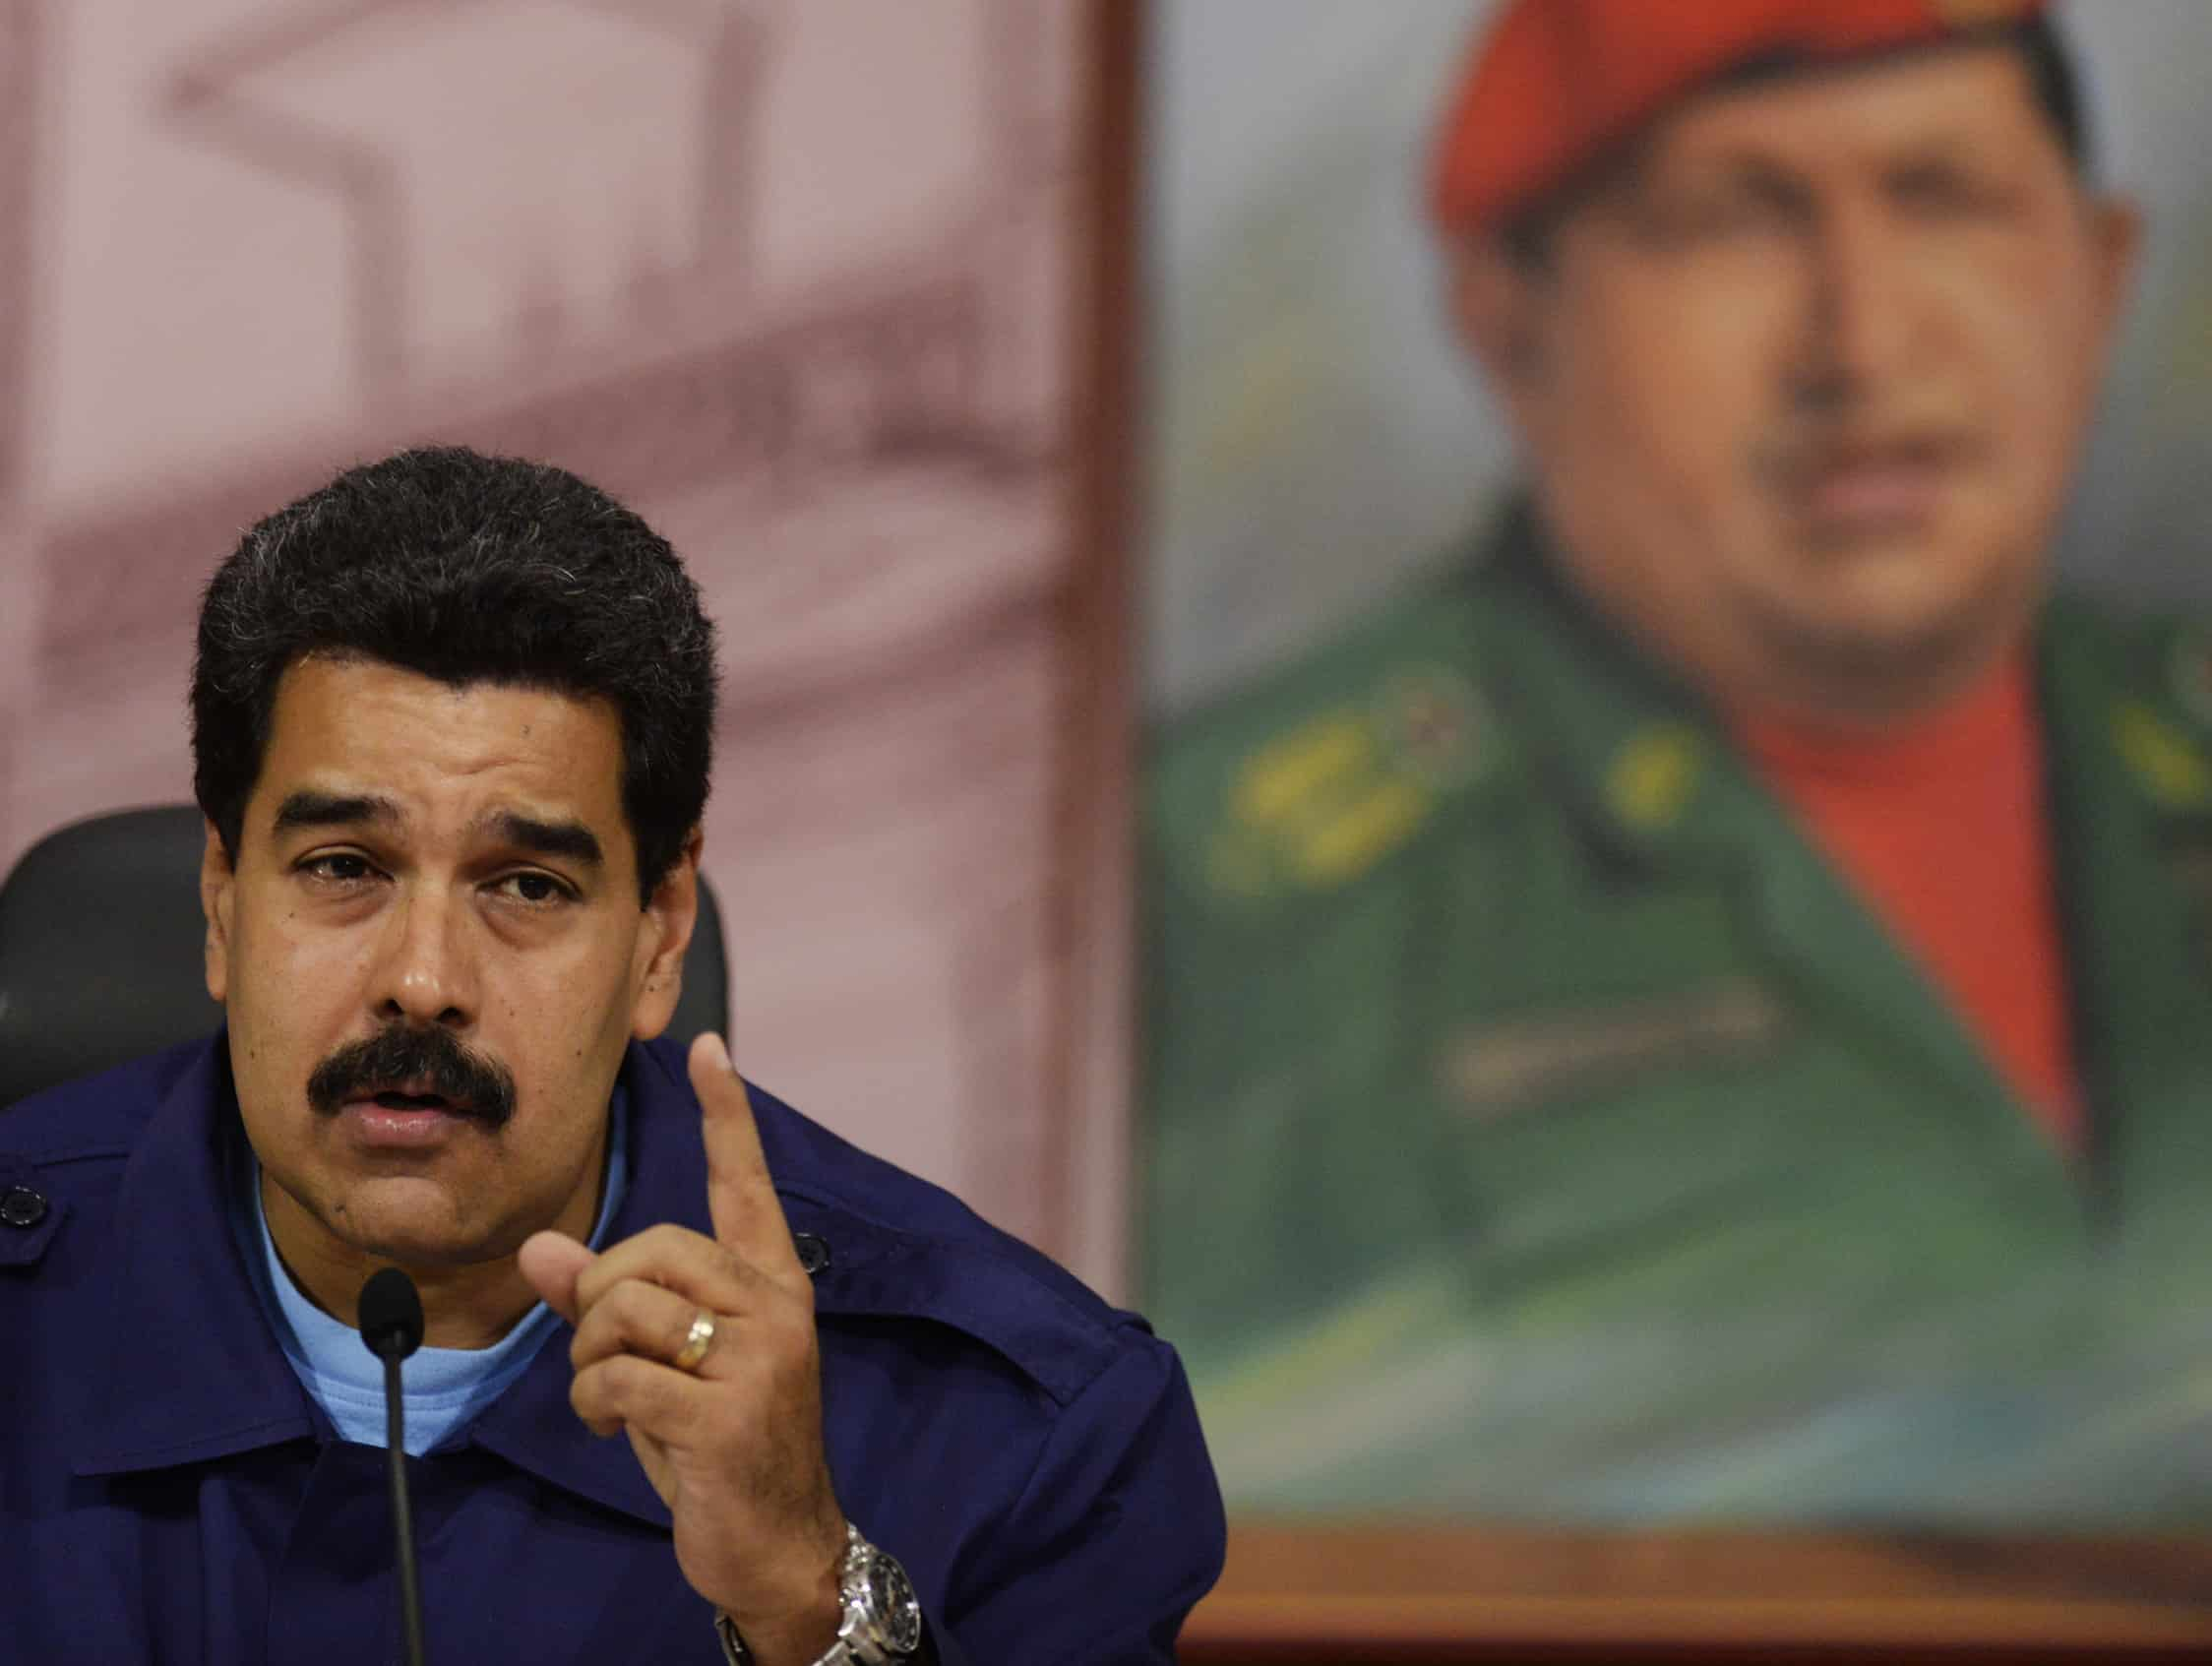 Venezuelan President Nicolás Maduro speaks during a press conference.